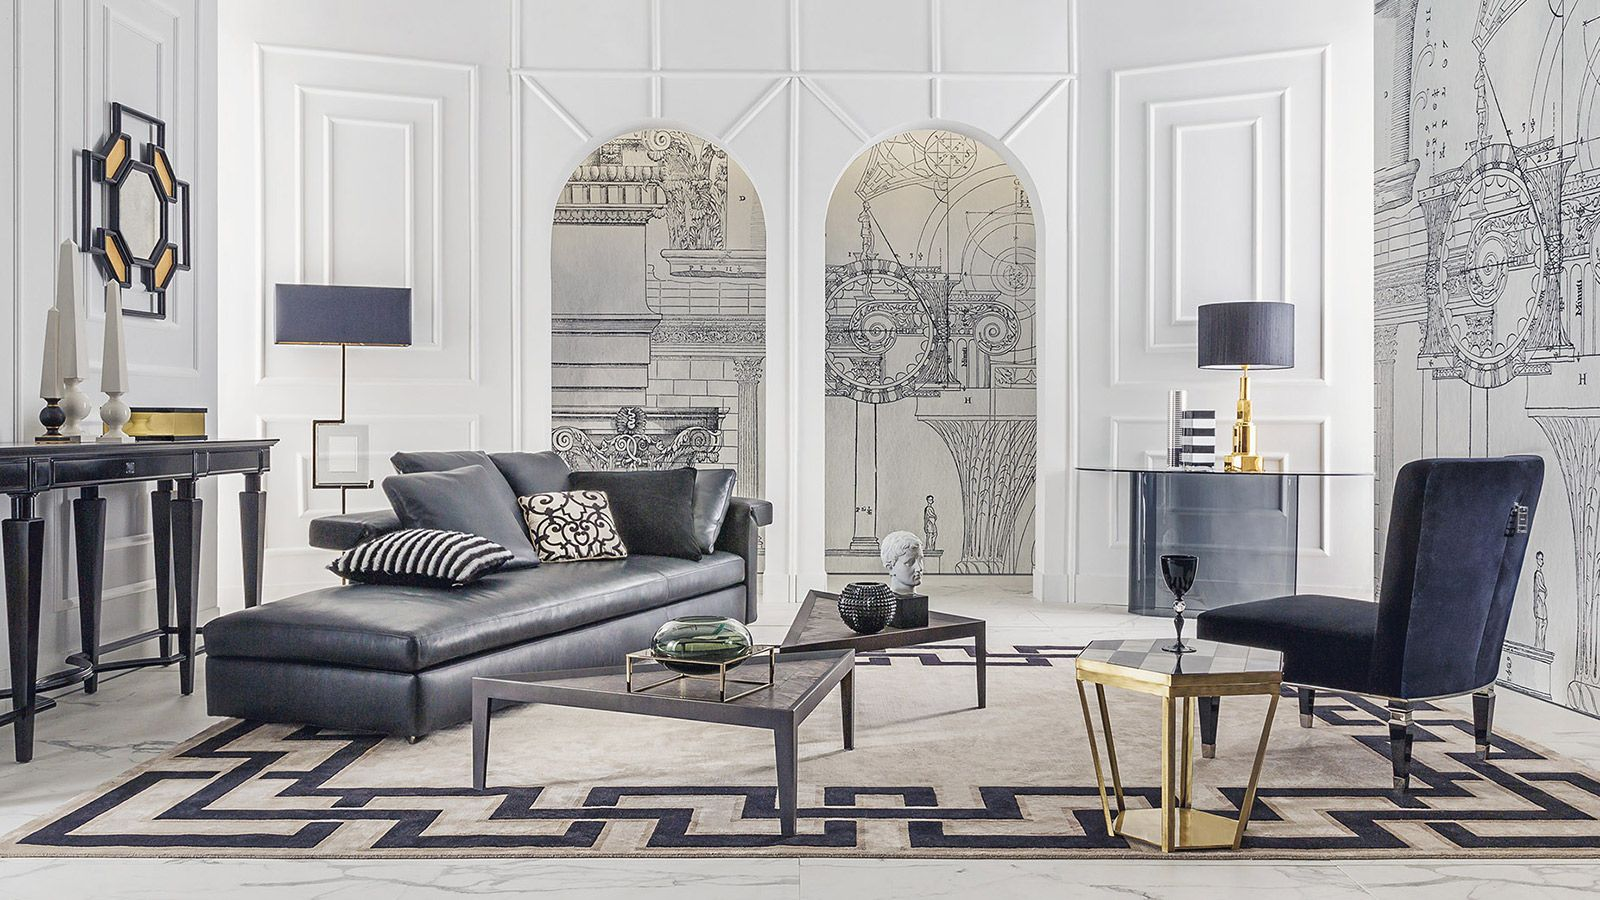 Black On White With Images Classic Interior Design Interior